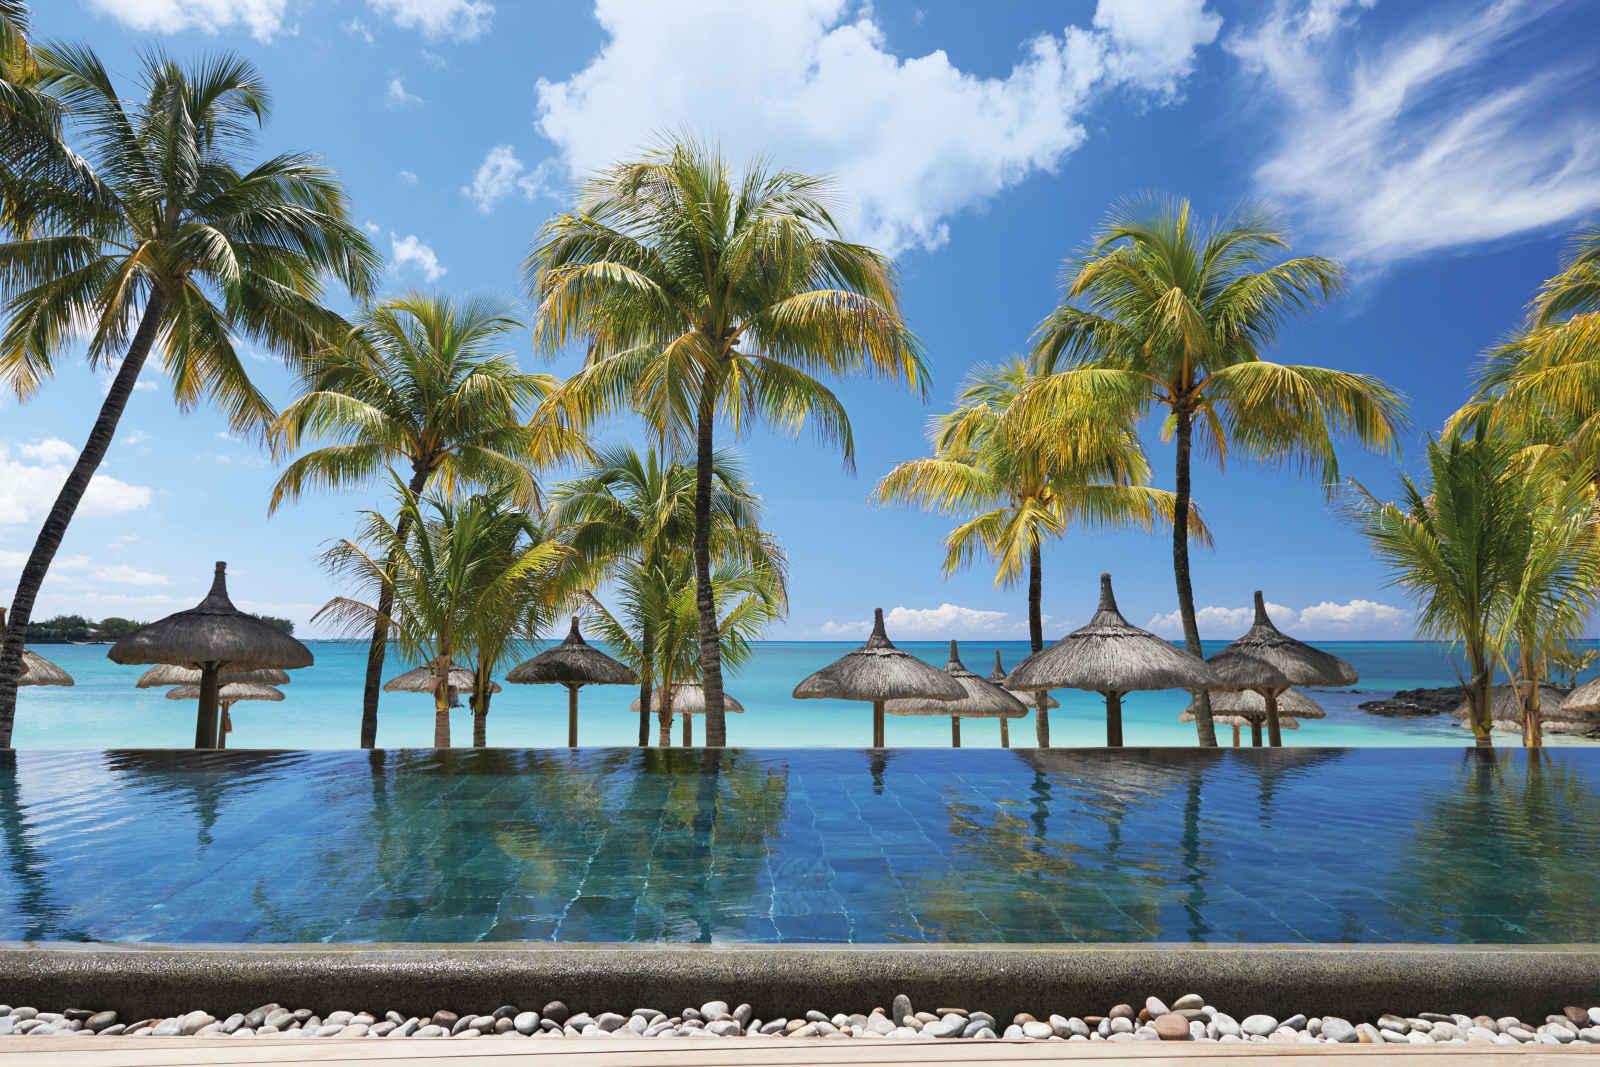 Royal Palm Beachcomber Luxury - 5.5*